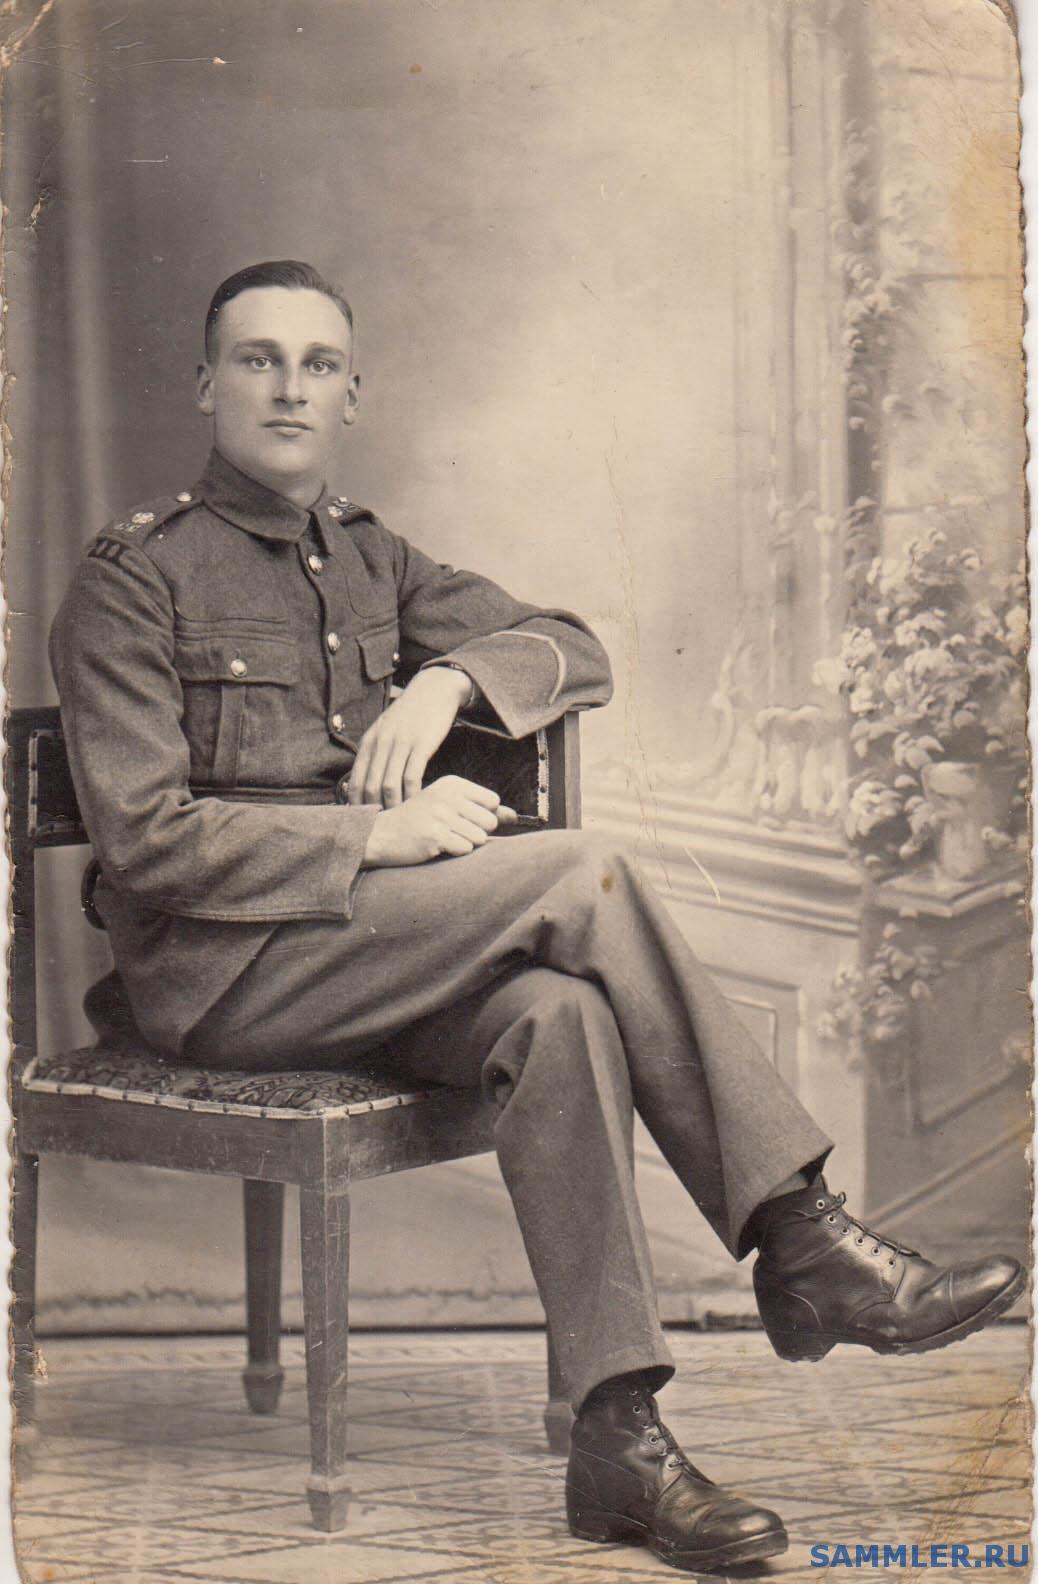 Coldstream_Guards_3rd_Battalion_Jerusalem_Palestine_1939.jpg